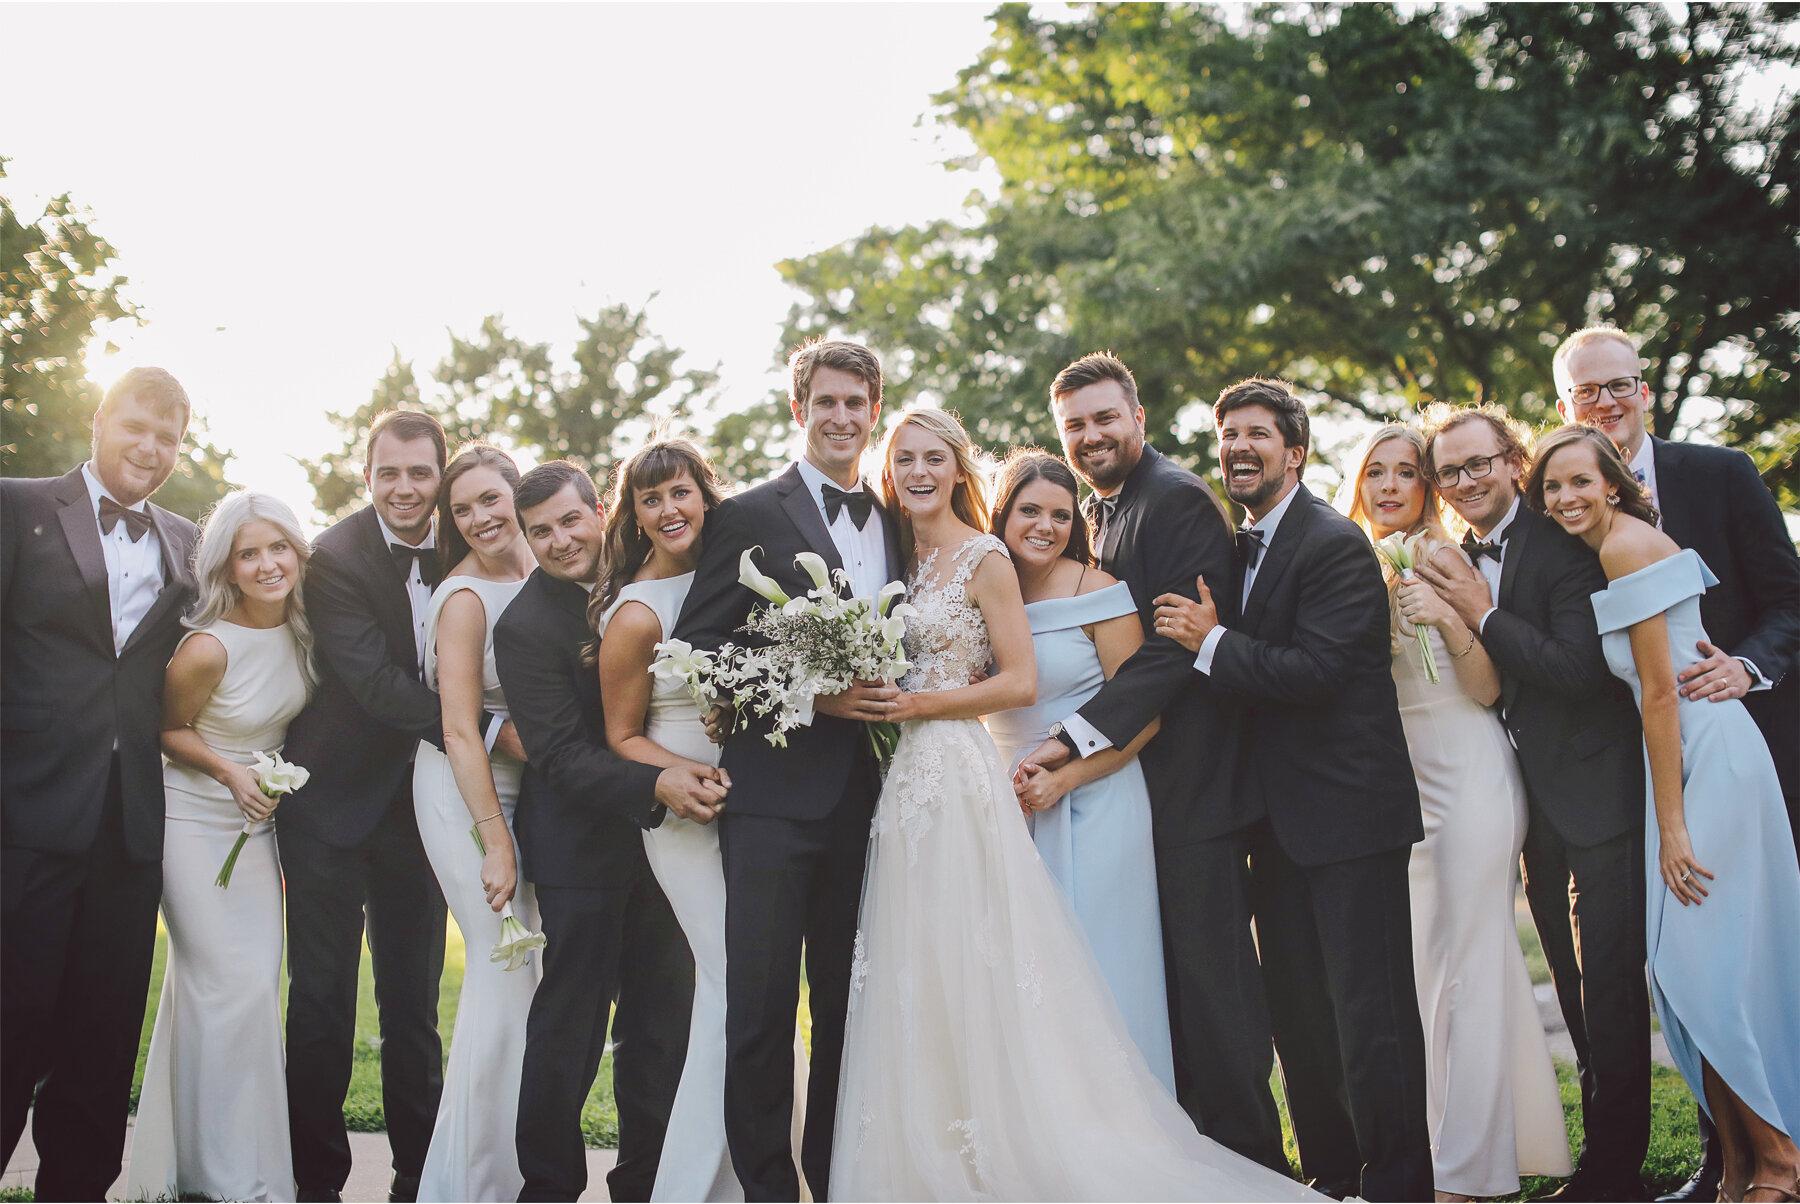 15 Wedding Vick Photography Minneapolis Minnesota Bridesmaids Groomsmen Michelle and William.jpg